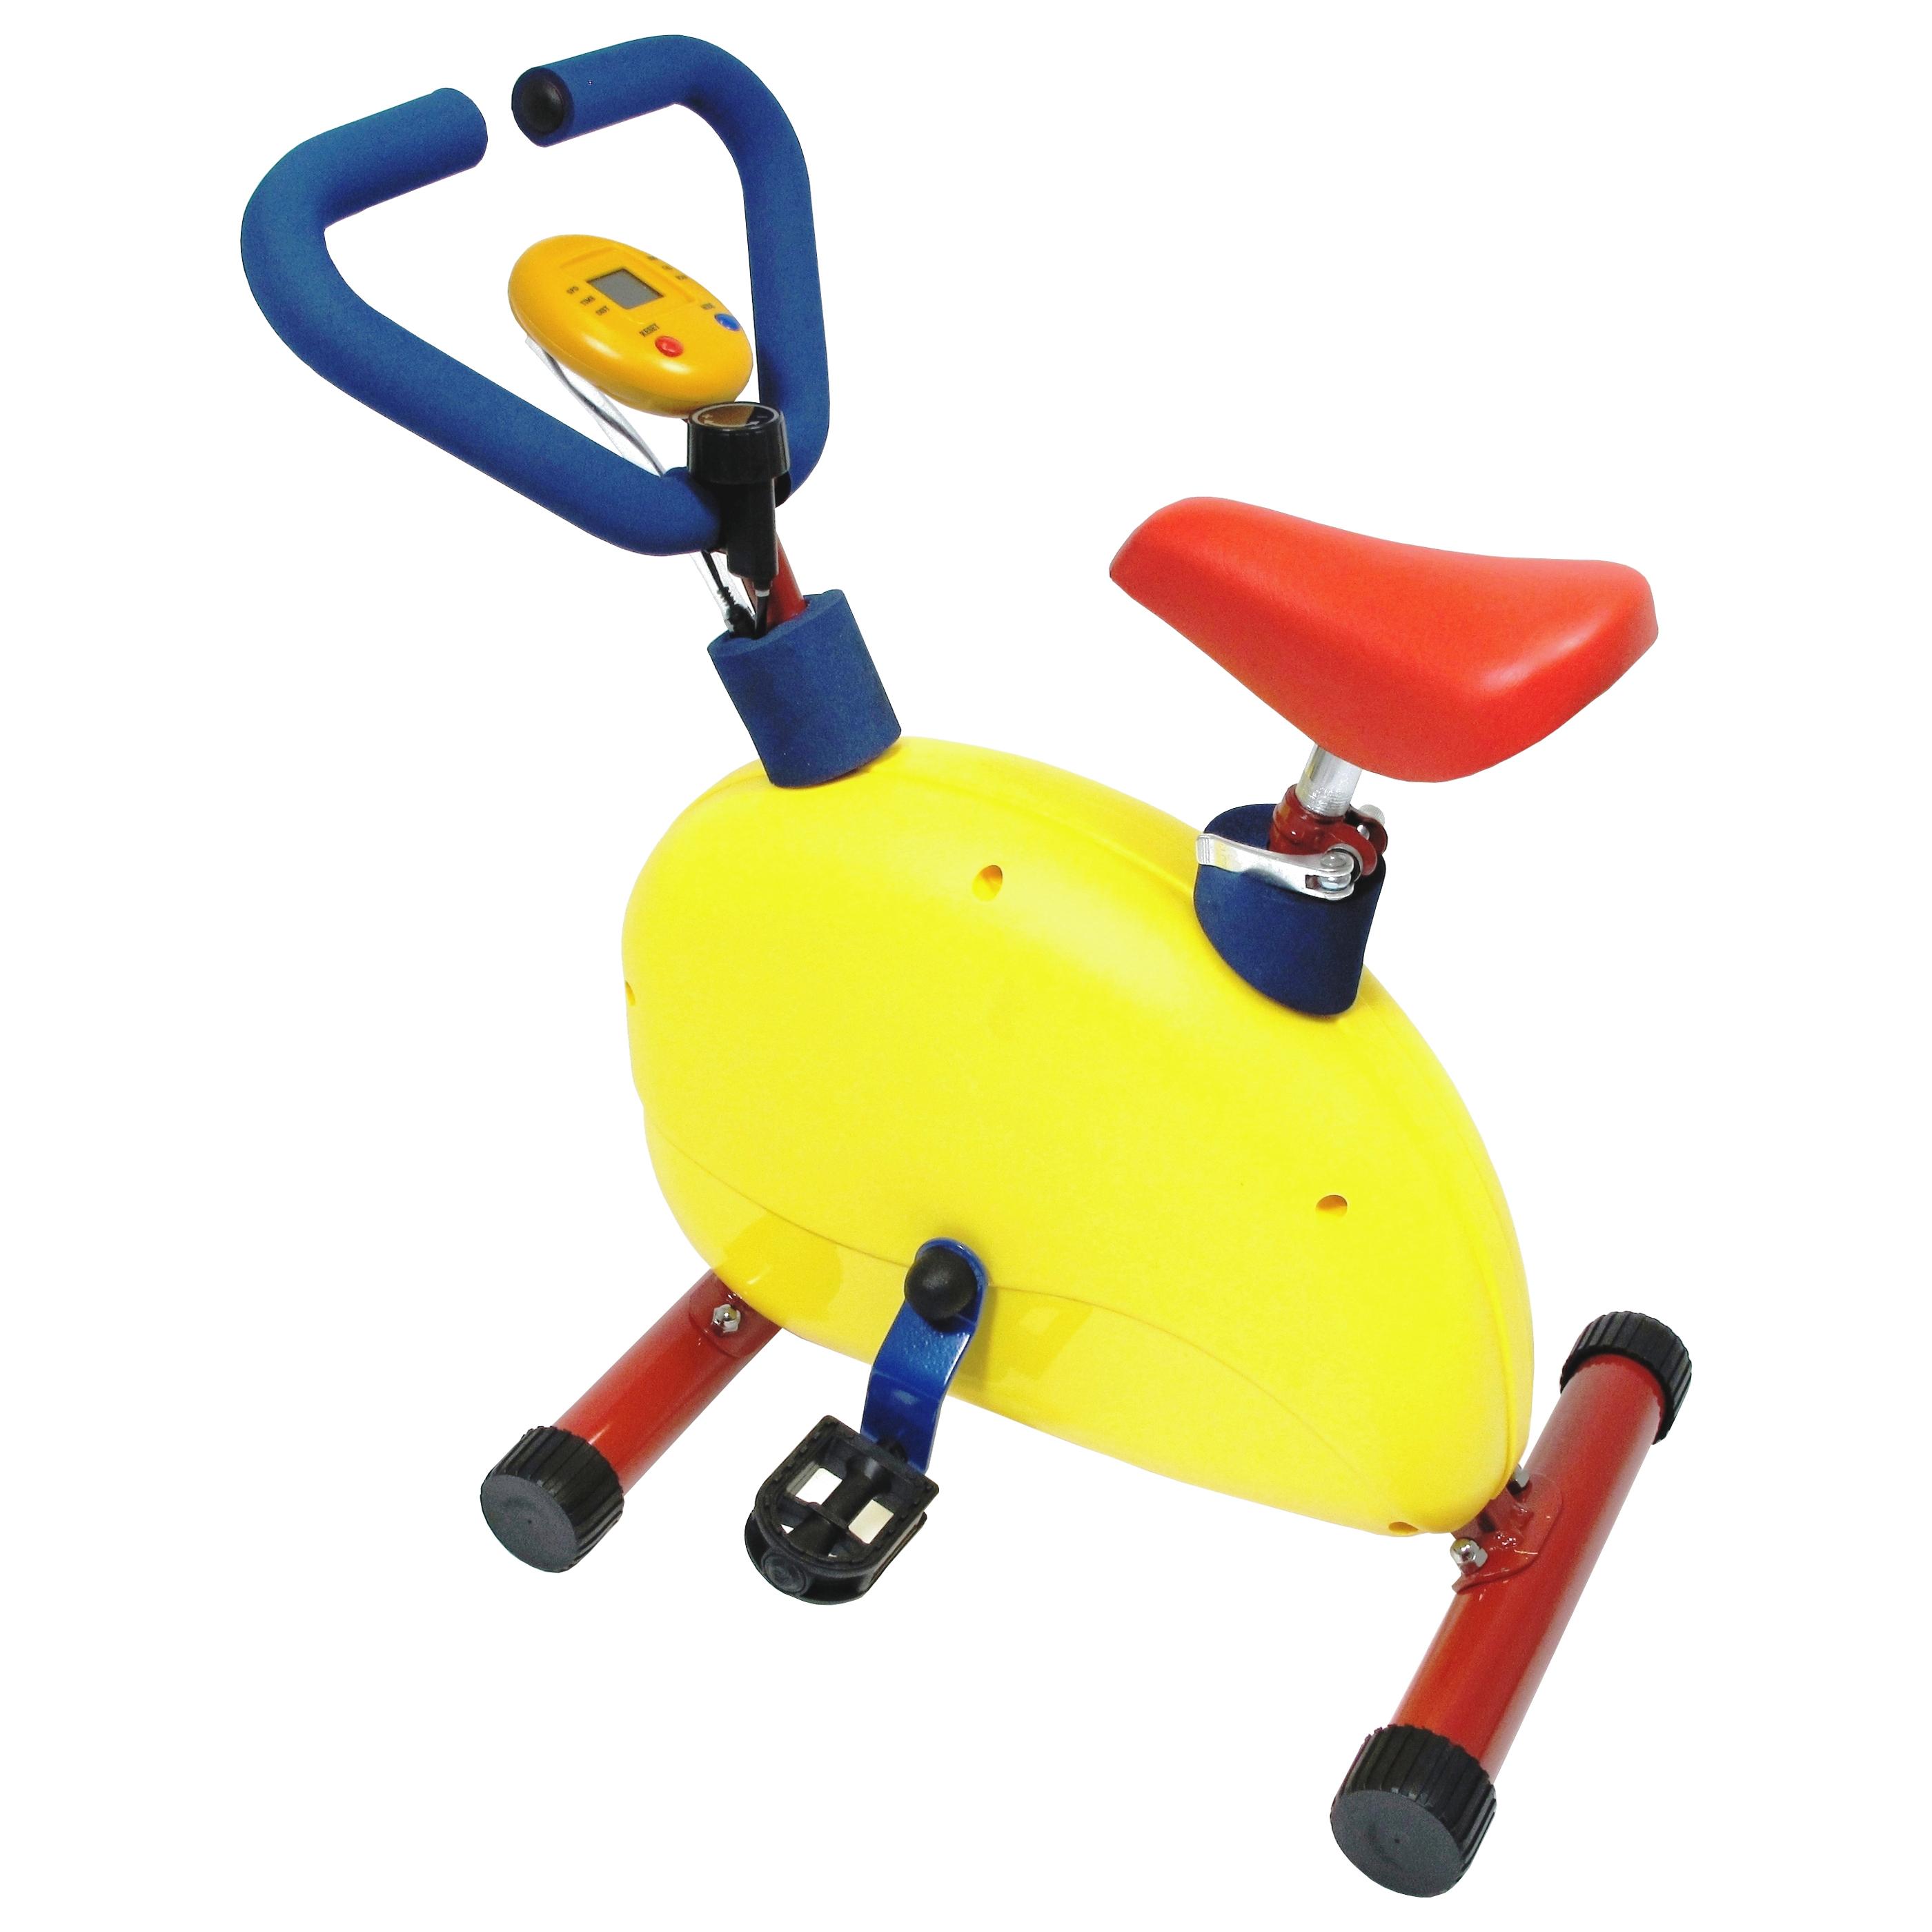 Fun & Fitness for Kids - Stationary Bike